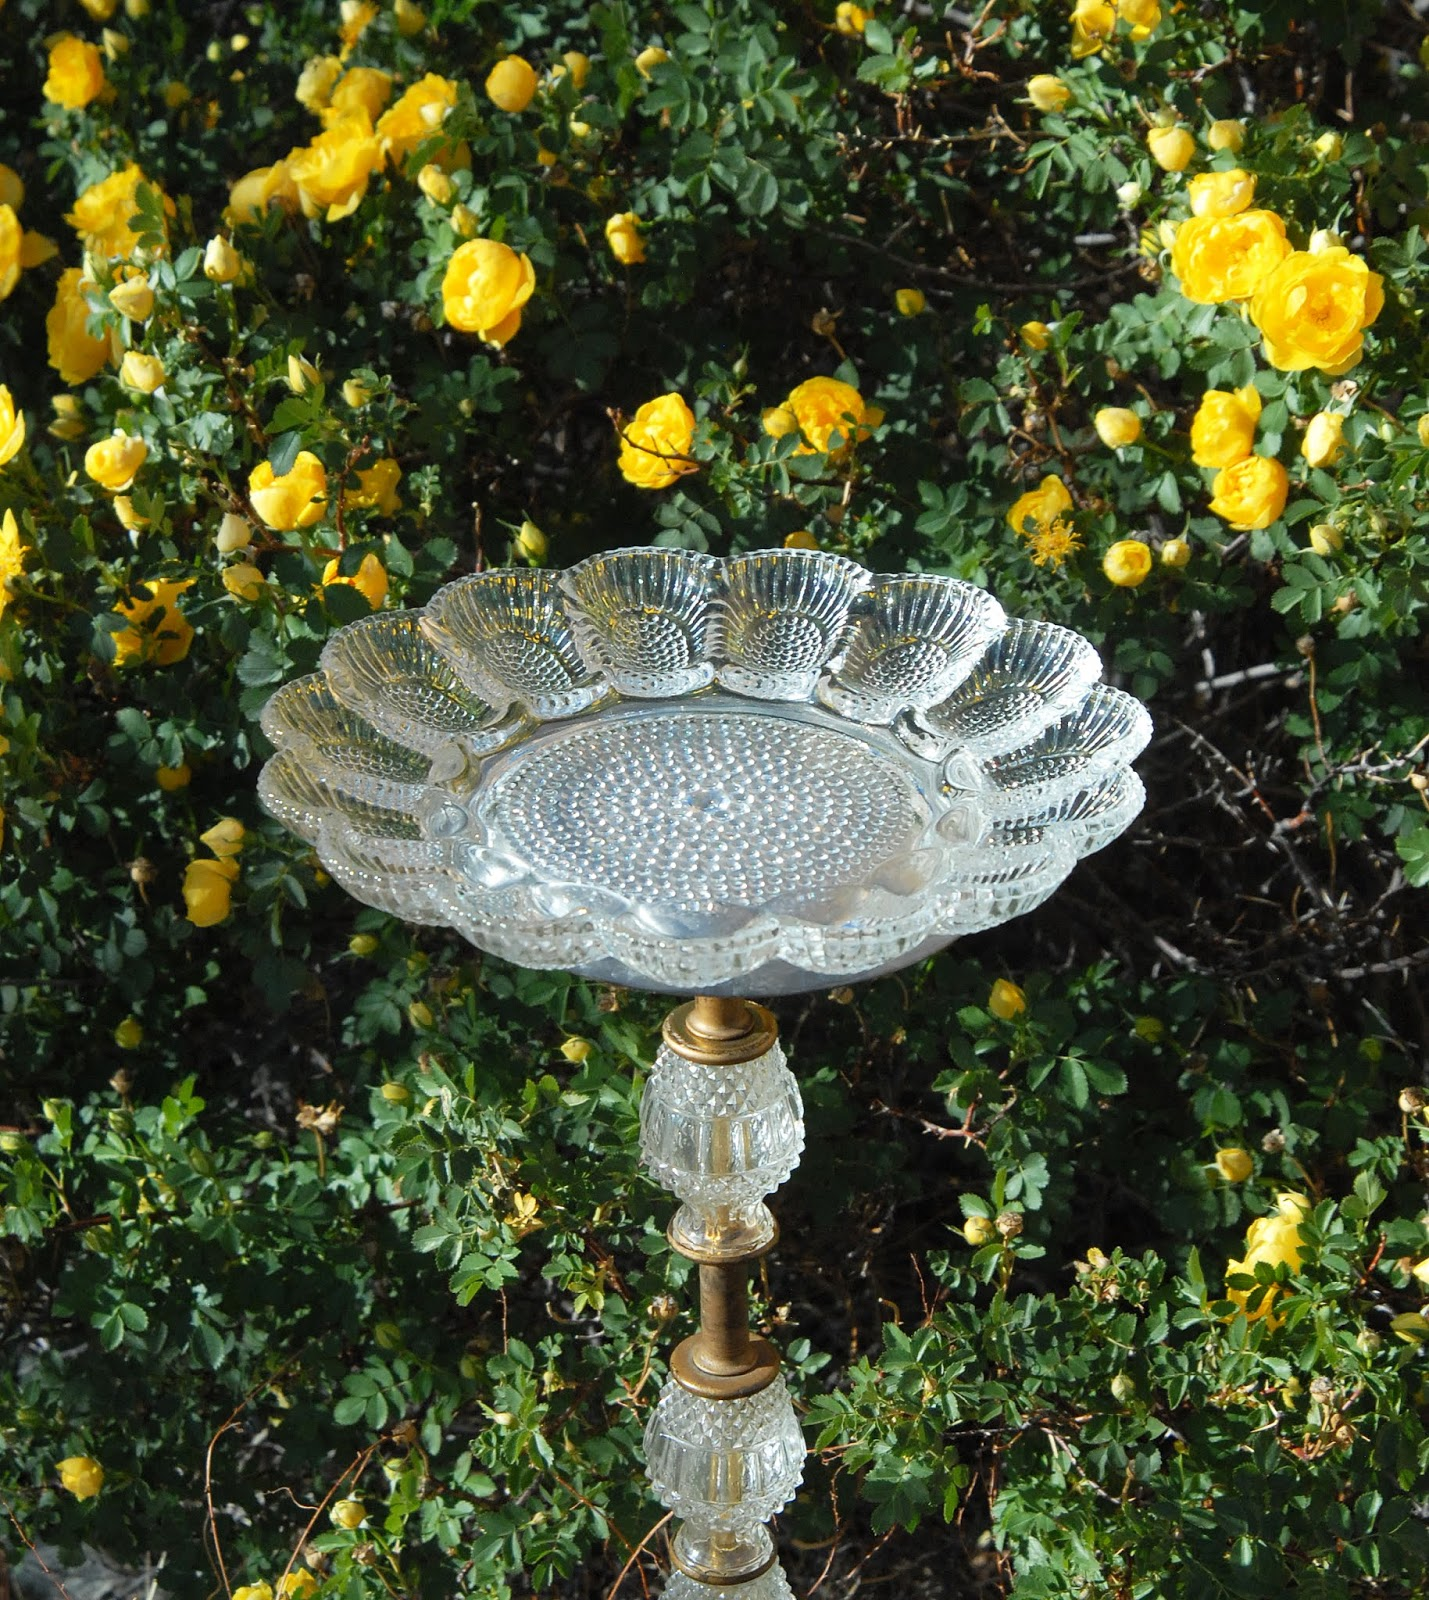 Vintage Lamp Bird Bath - DIY Tutorial and Review